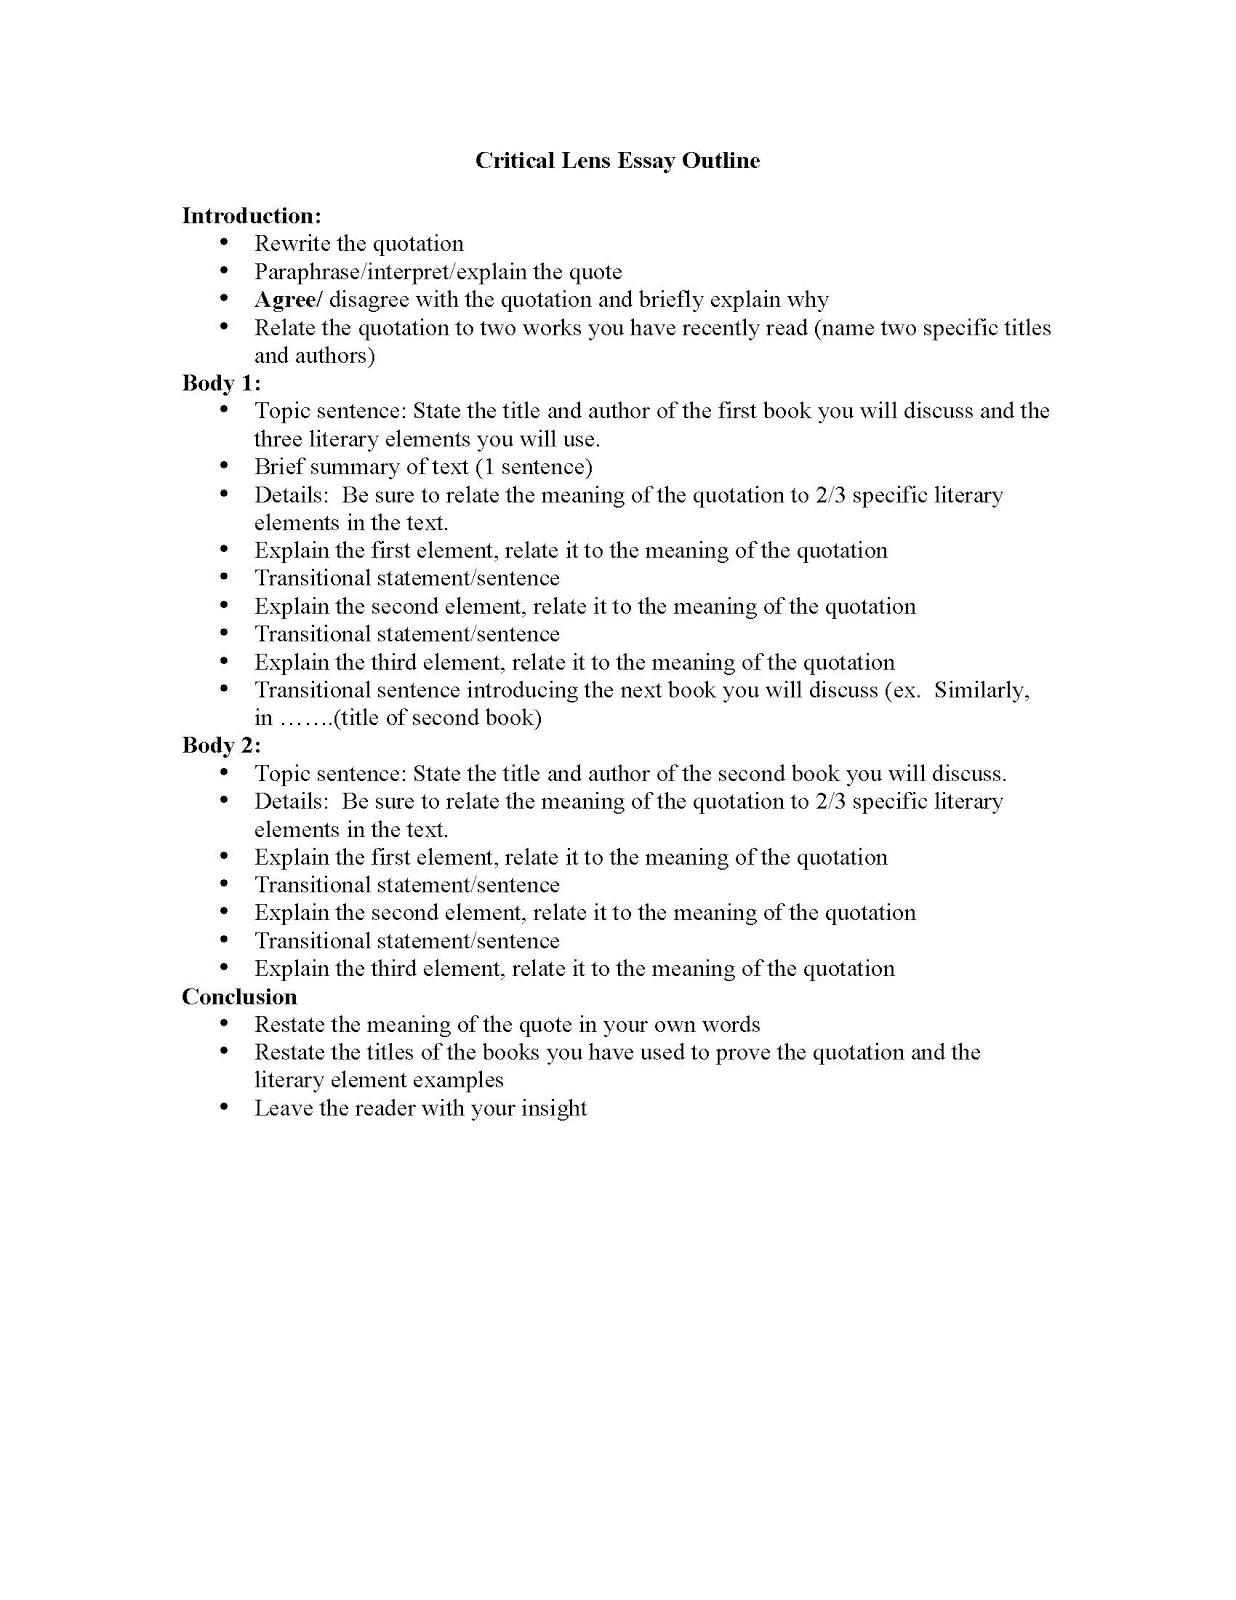 001 Essay Example Outline Of An Criticallensessayoutlineandliterayelements Page 1 Sensational Argumentative Sample Co Education Pdf Full